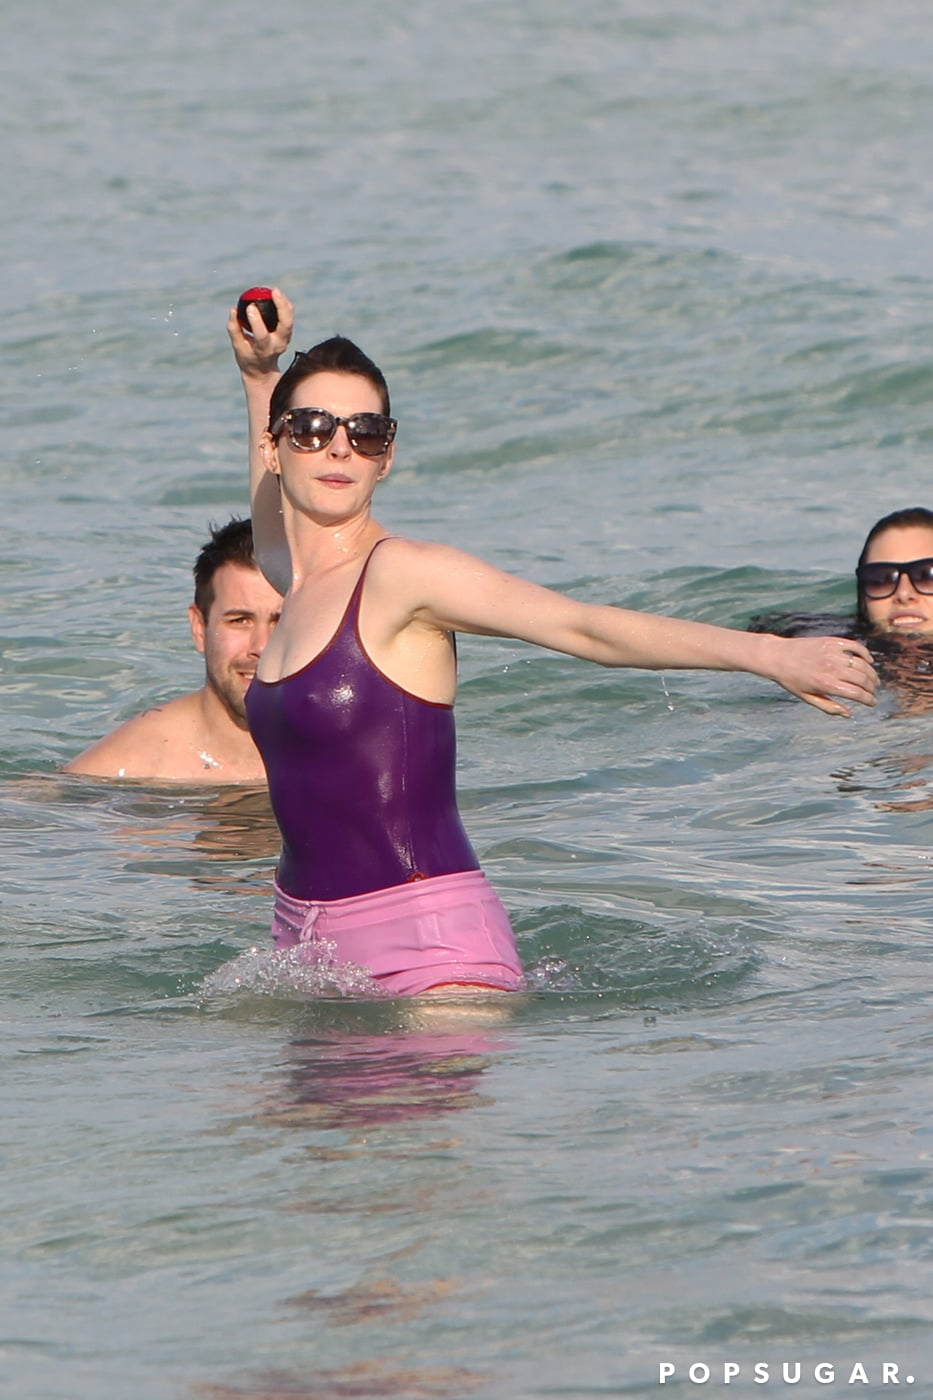 Here's Why We All Want a Husband Like Anne Hathaway's